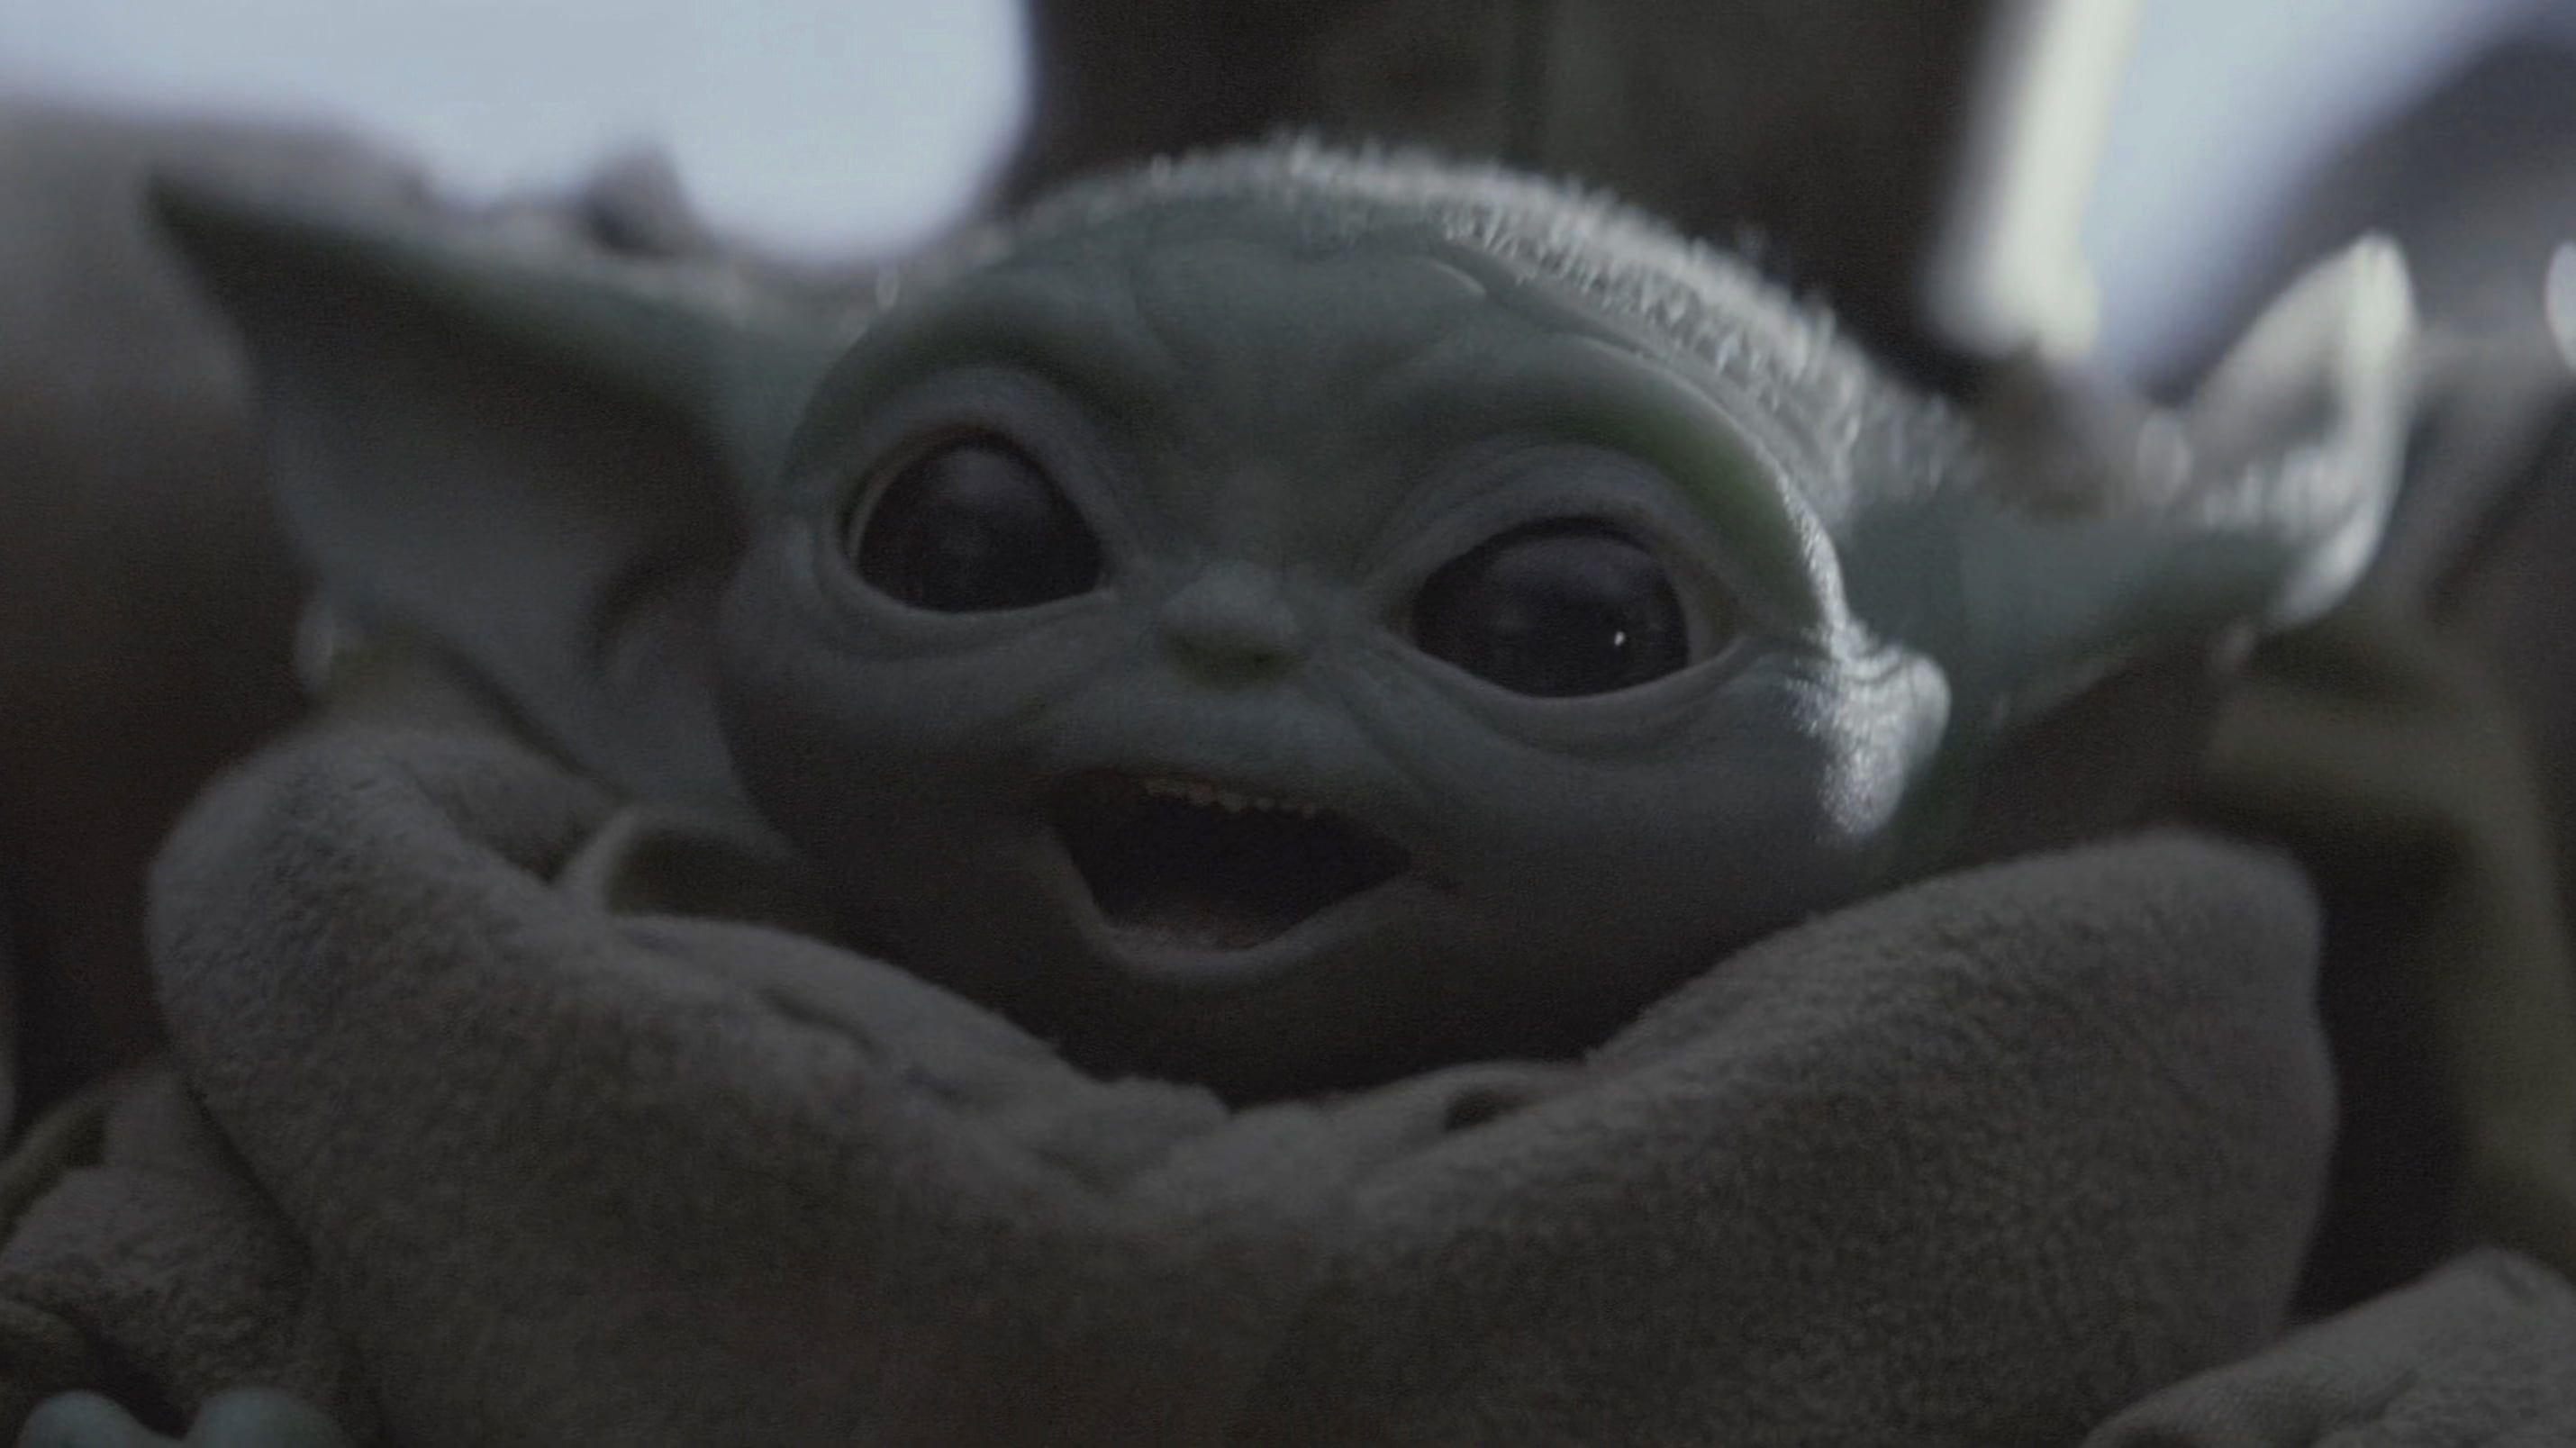 Baby Yoda Computer Wallpaper Http Wallpapersalbum Com Baby Yoda Computer Wallpaper Html Yoda Meme Star Wars Baby Star Wars Memes